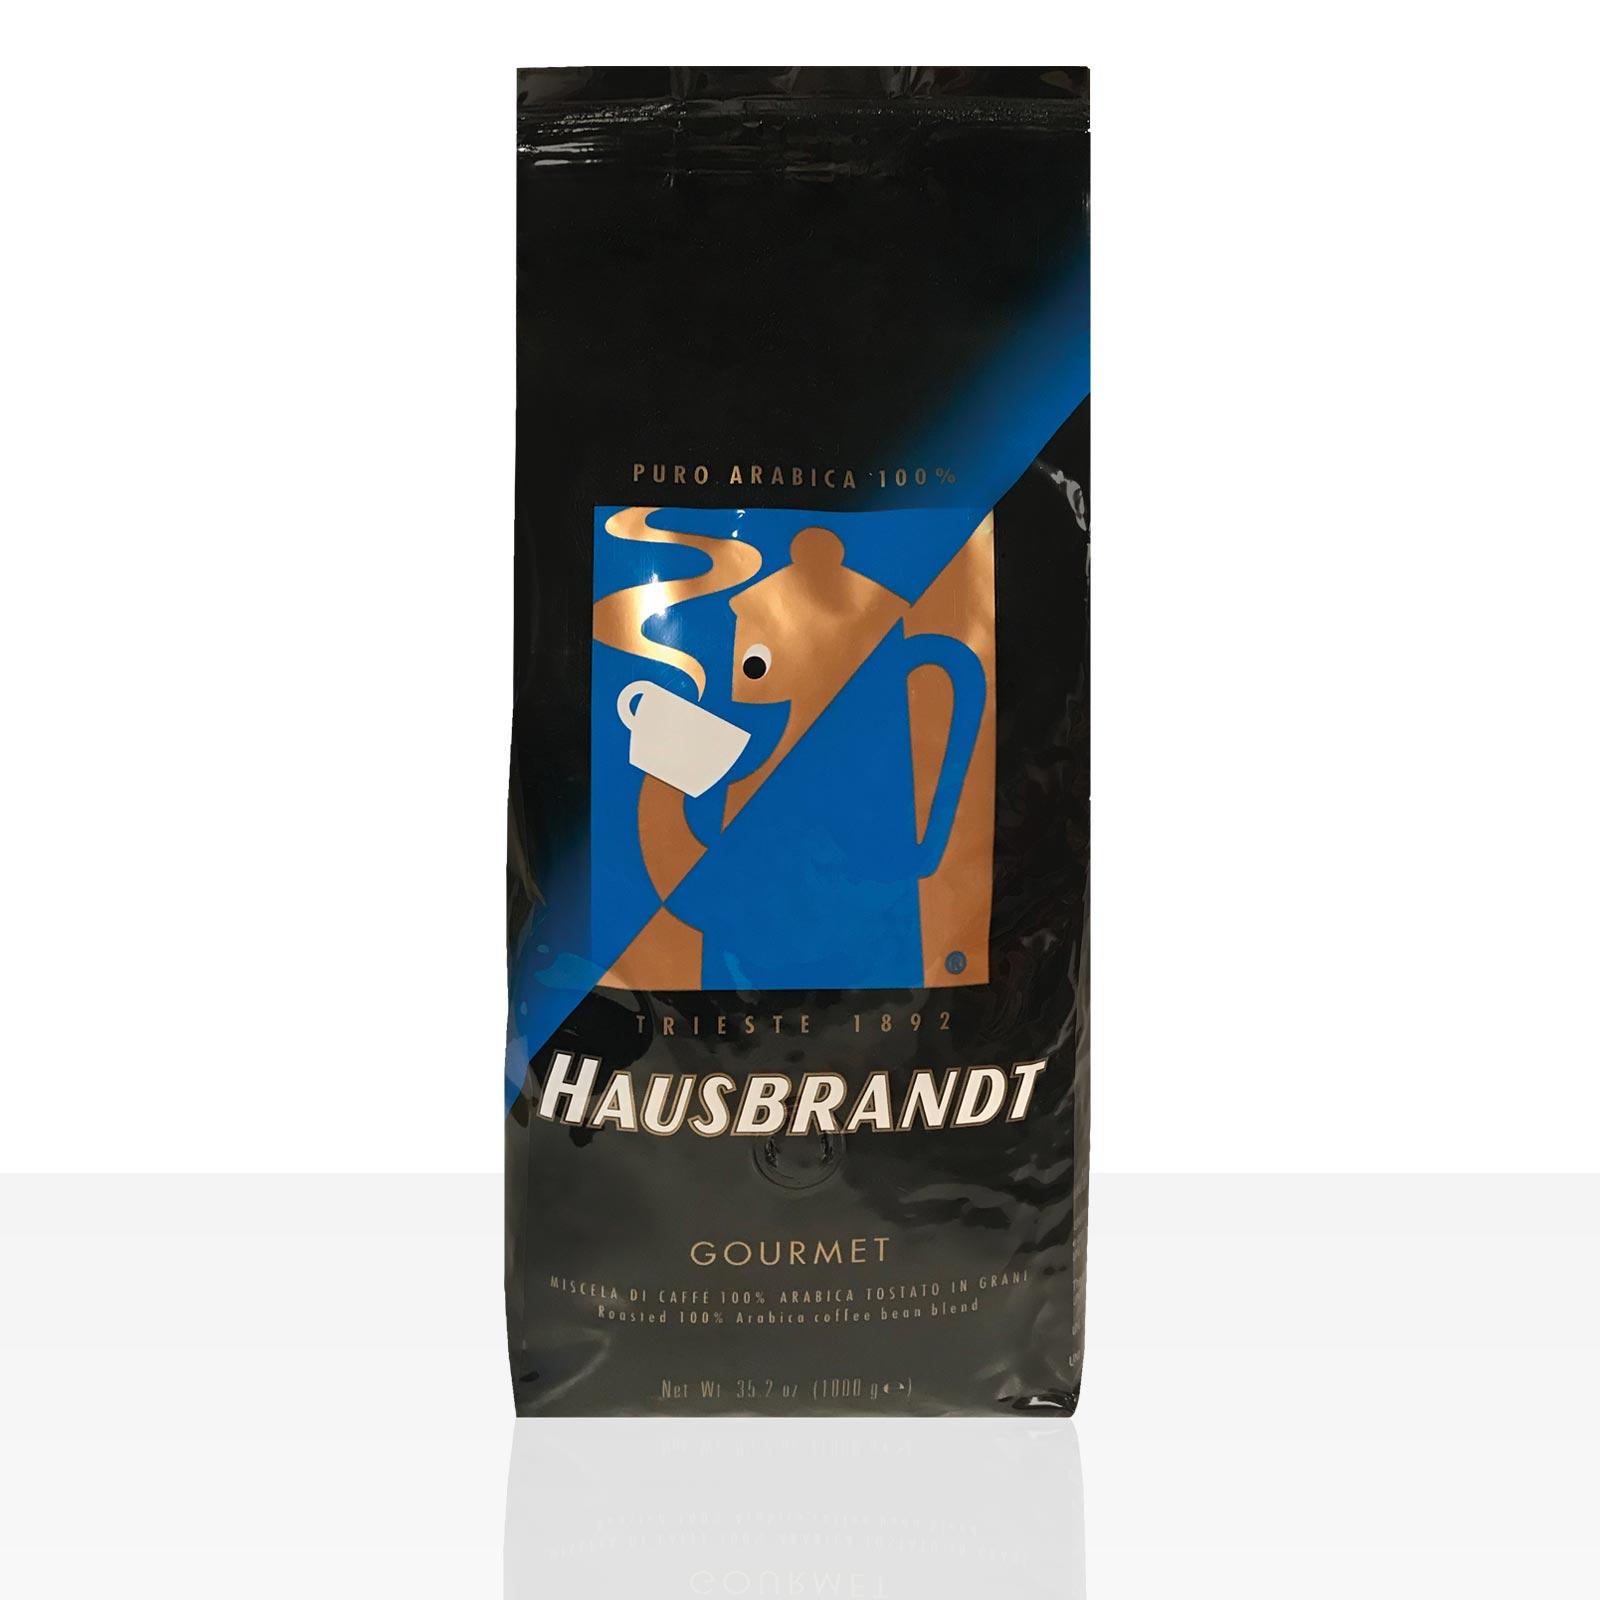 Hausbrandt Gourmet Espresso 1kg Kaffee ganze Bohne, 100% Arabica